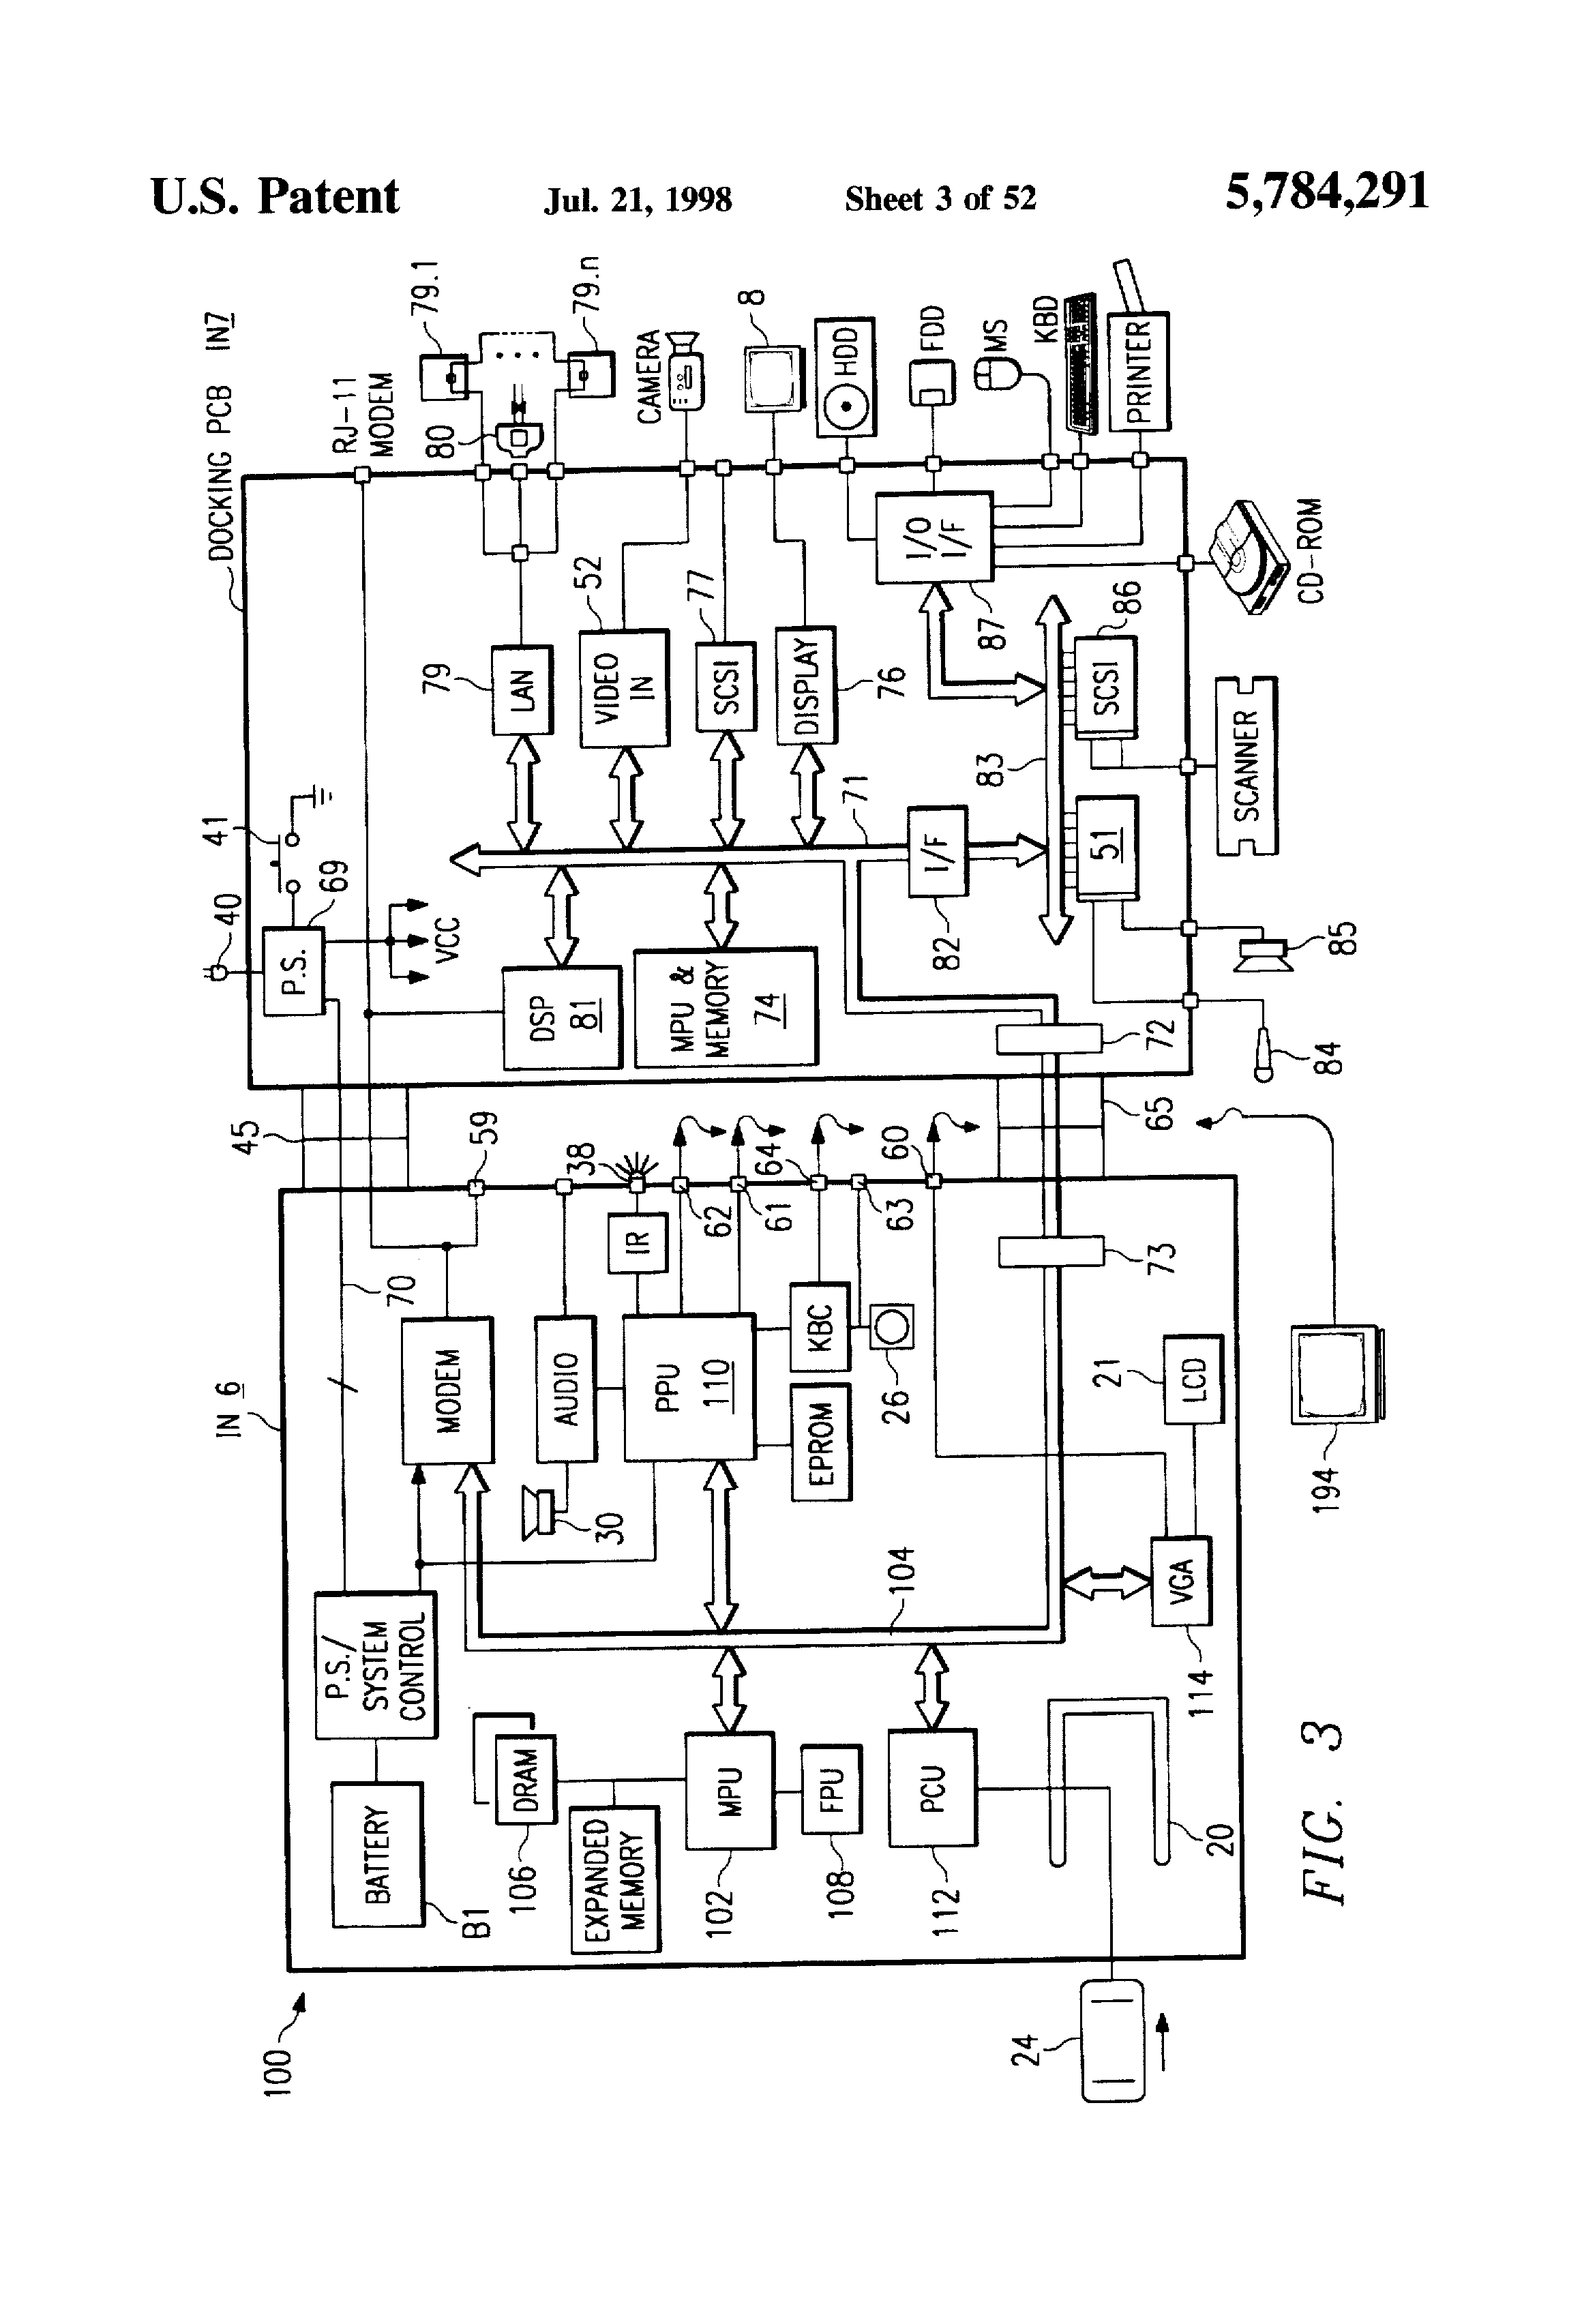 Schematics Technical Drawings Block Diagram Blue Print